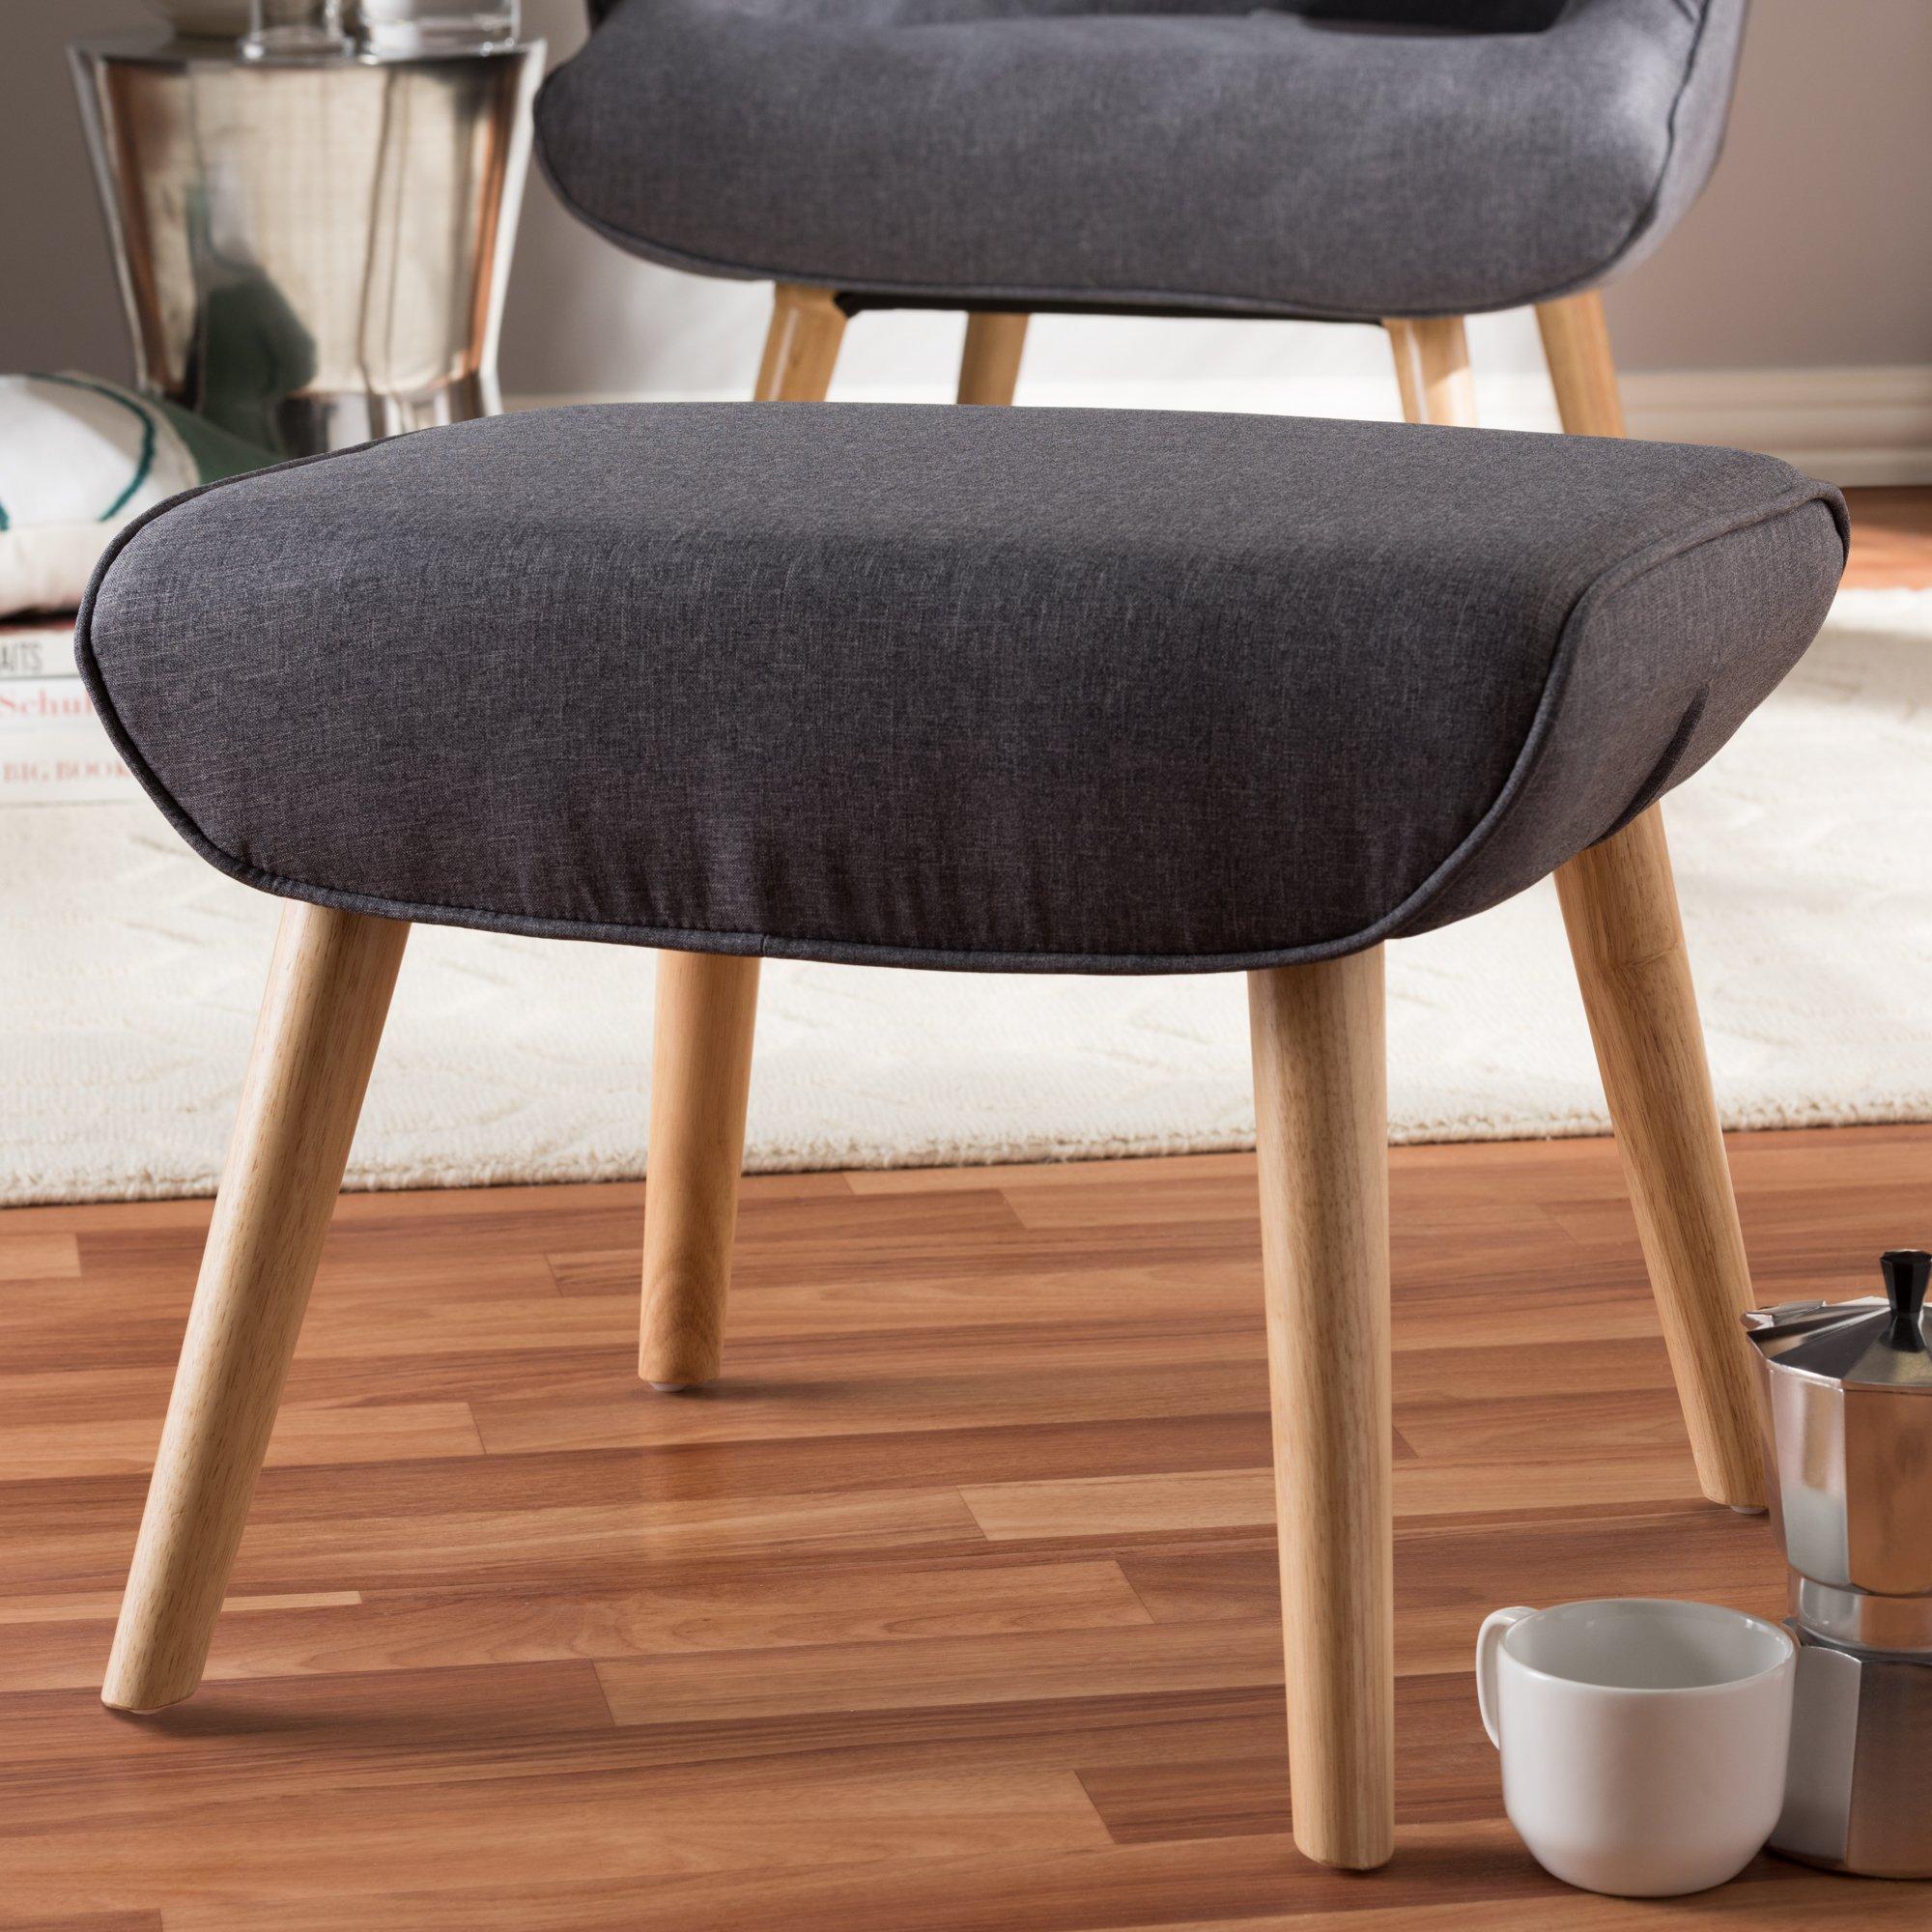 Baxton Studio Alden Mid-Century Modern Dark Grey Fabric Upholstered Natural Finished Wood Ottoman/Mid-Century/Grey/Light Wood/Fabric Polyester 100''/Rubber Wood/Foam